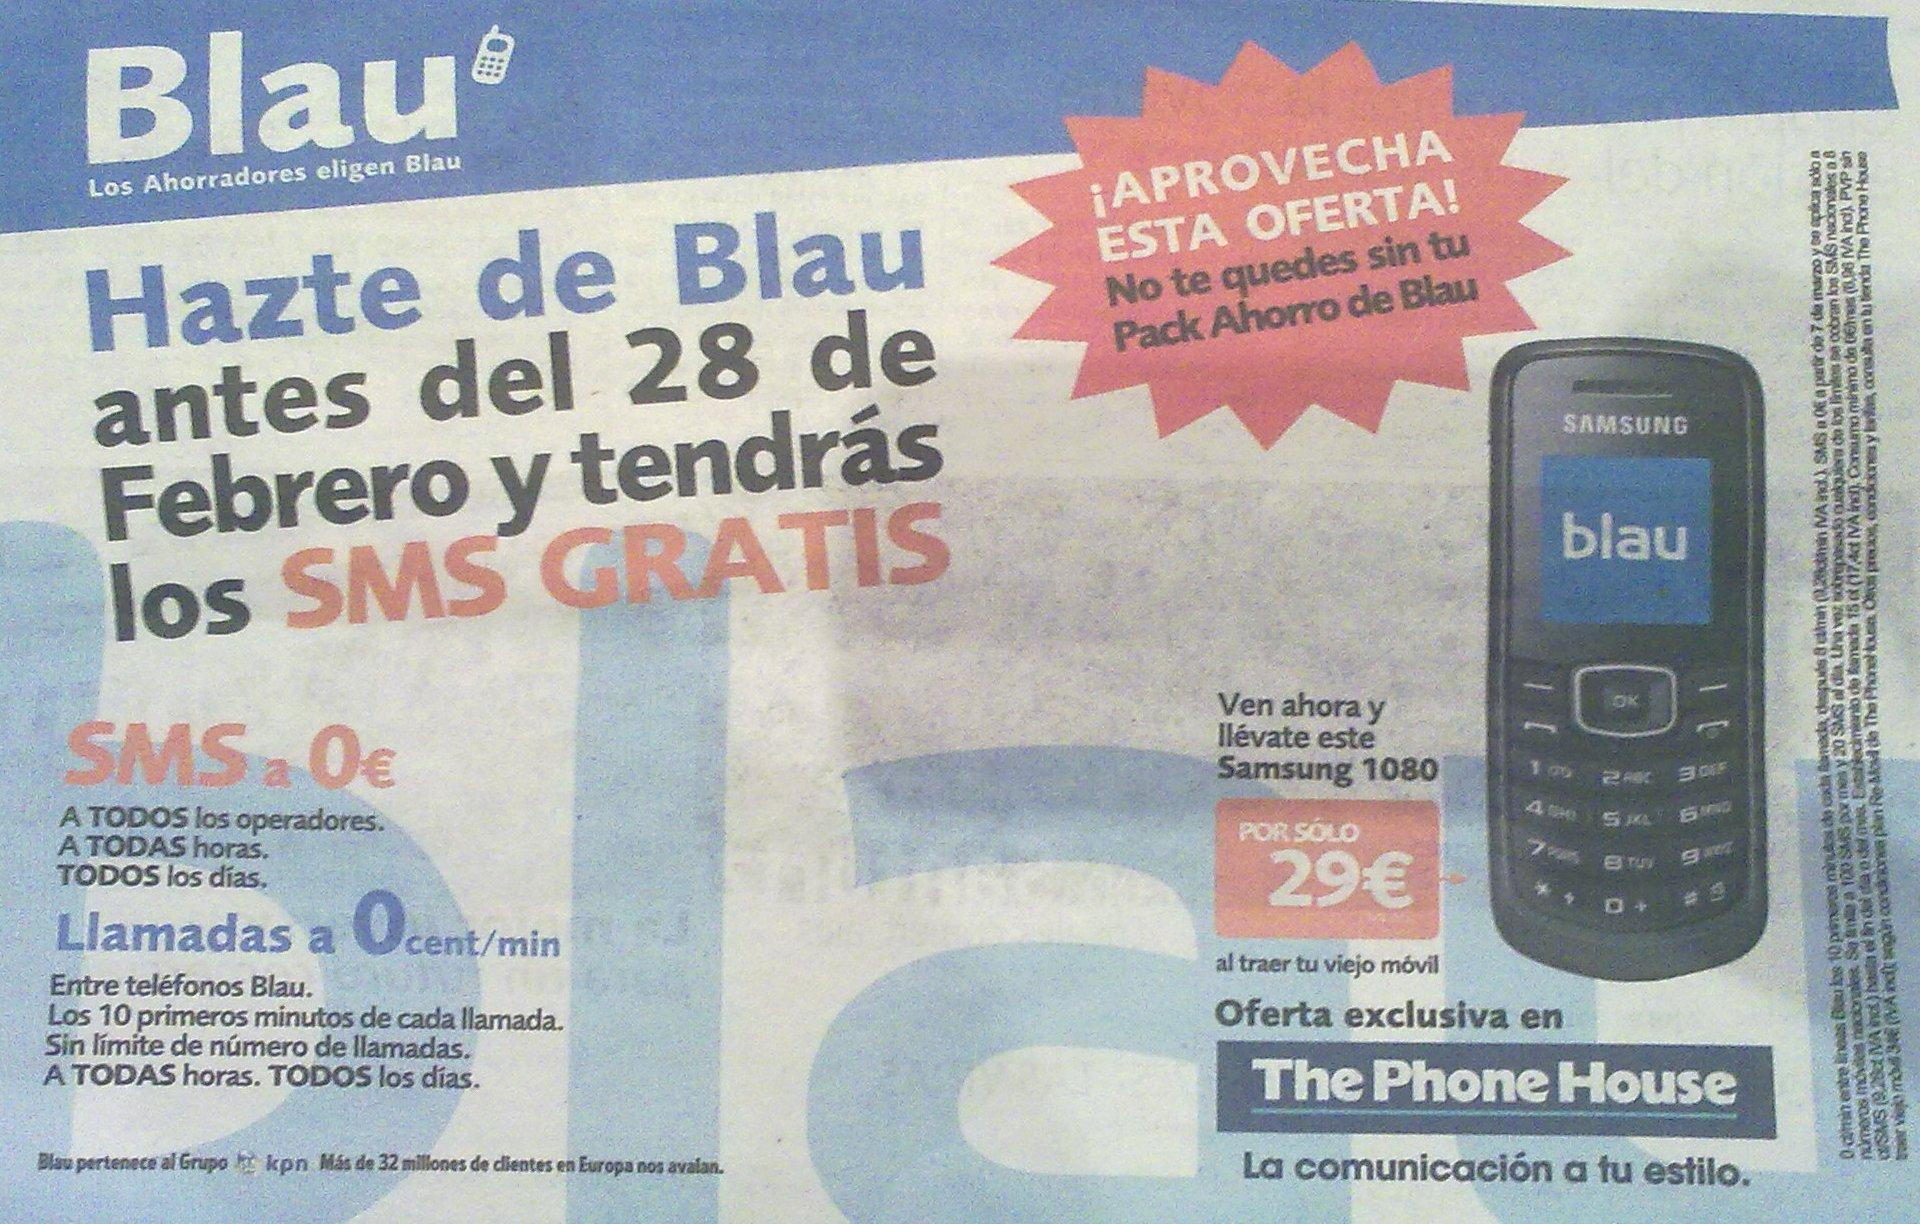 48b4fe999 Promoción de SMS gratis de Blau